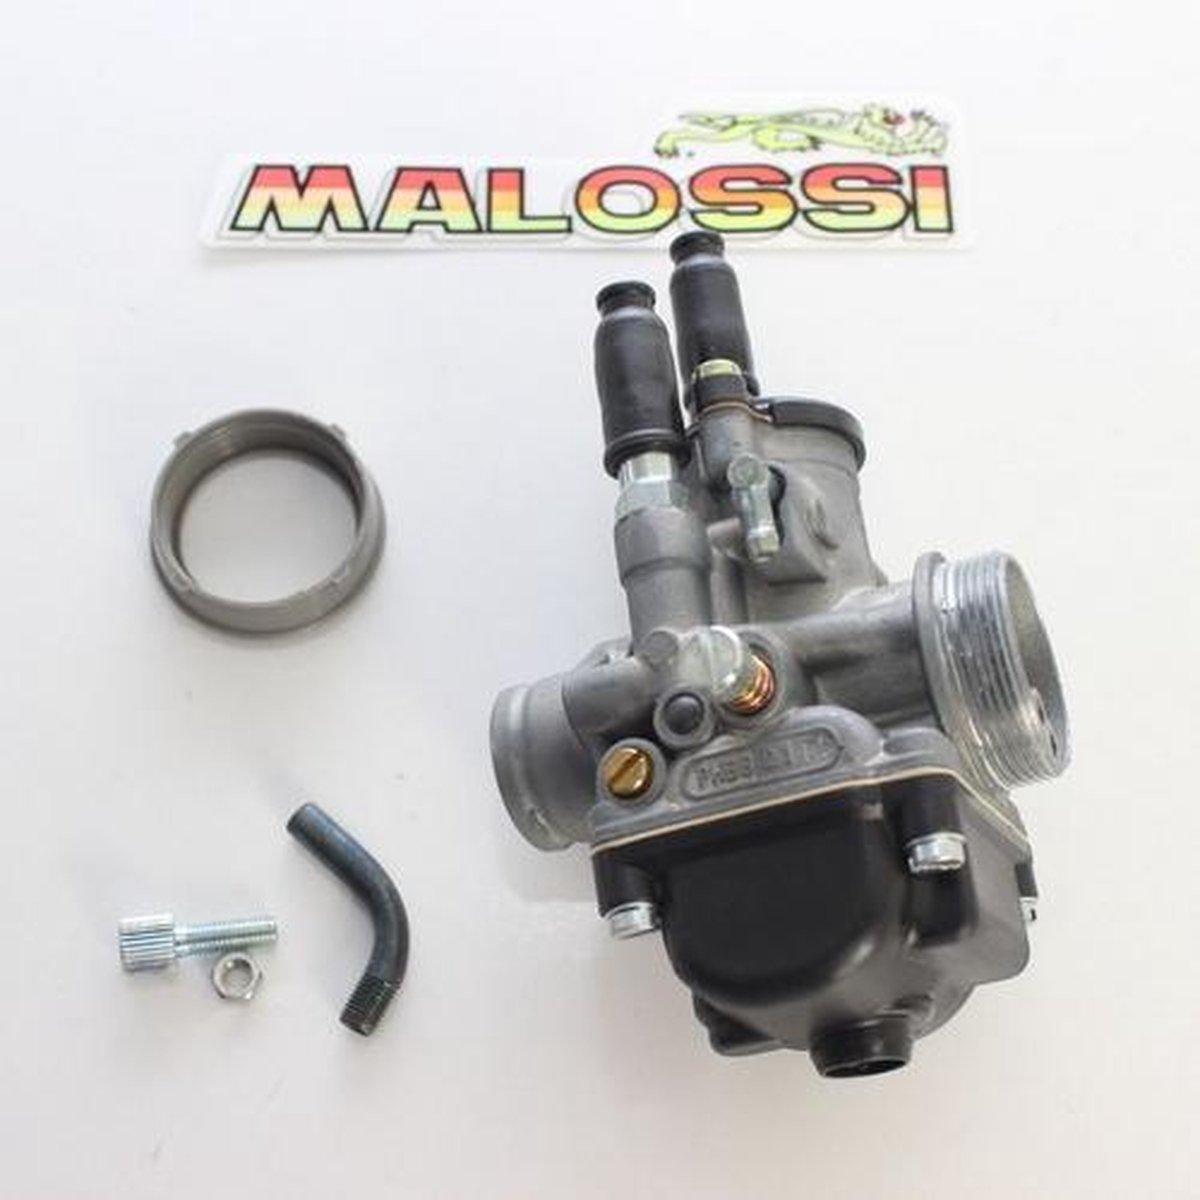 Carburateur Min. AM 6, RS50, TZR50, RS1, RS2, RX50 PHBG 21 DS Malossi  Aprilia RS50 Rieju RS1/RS2 Ma